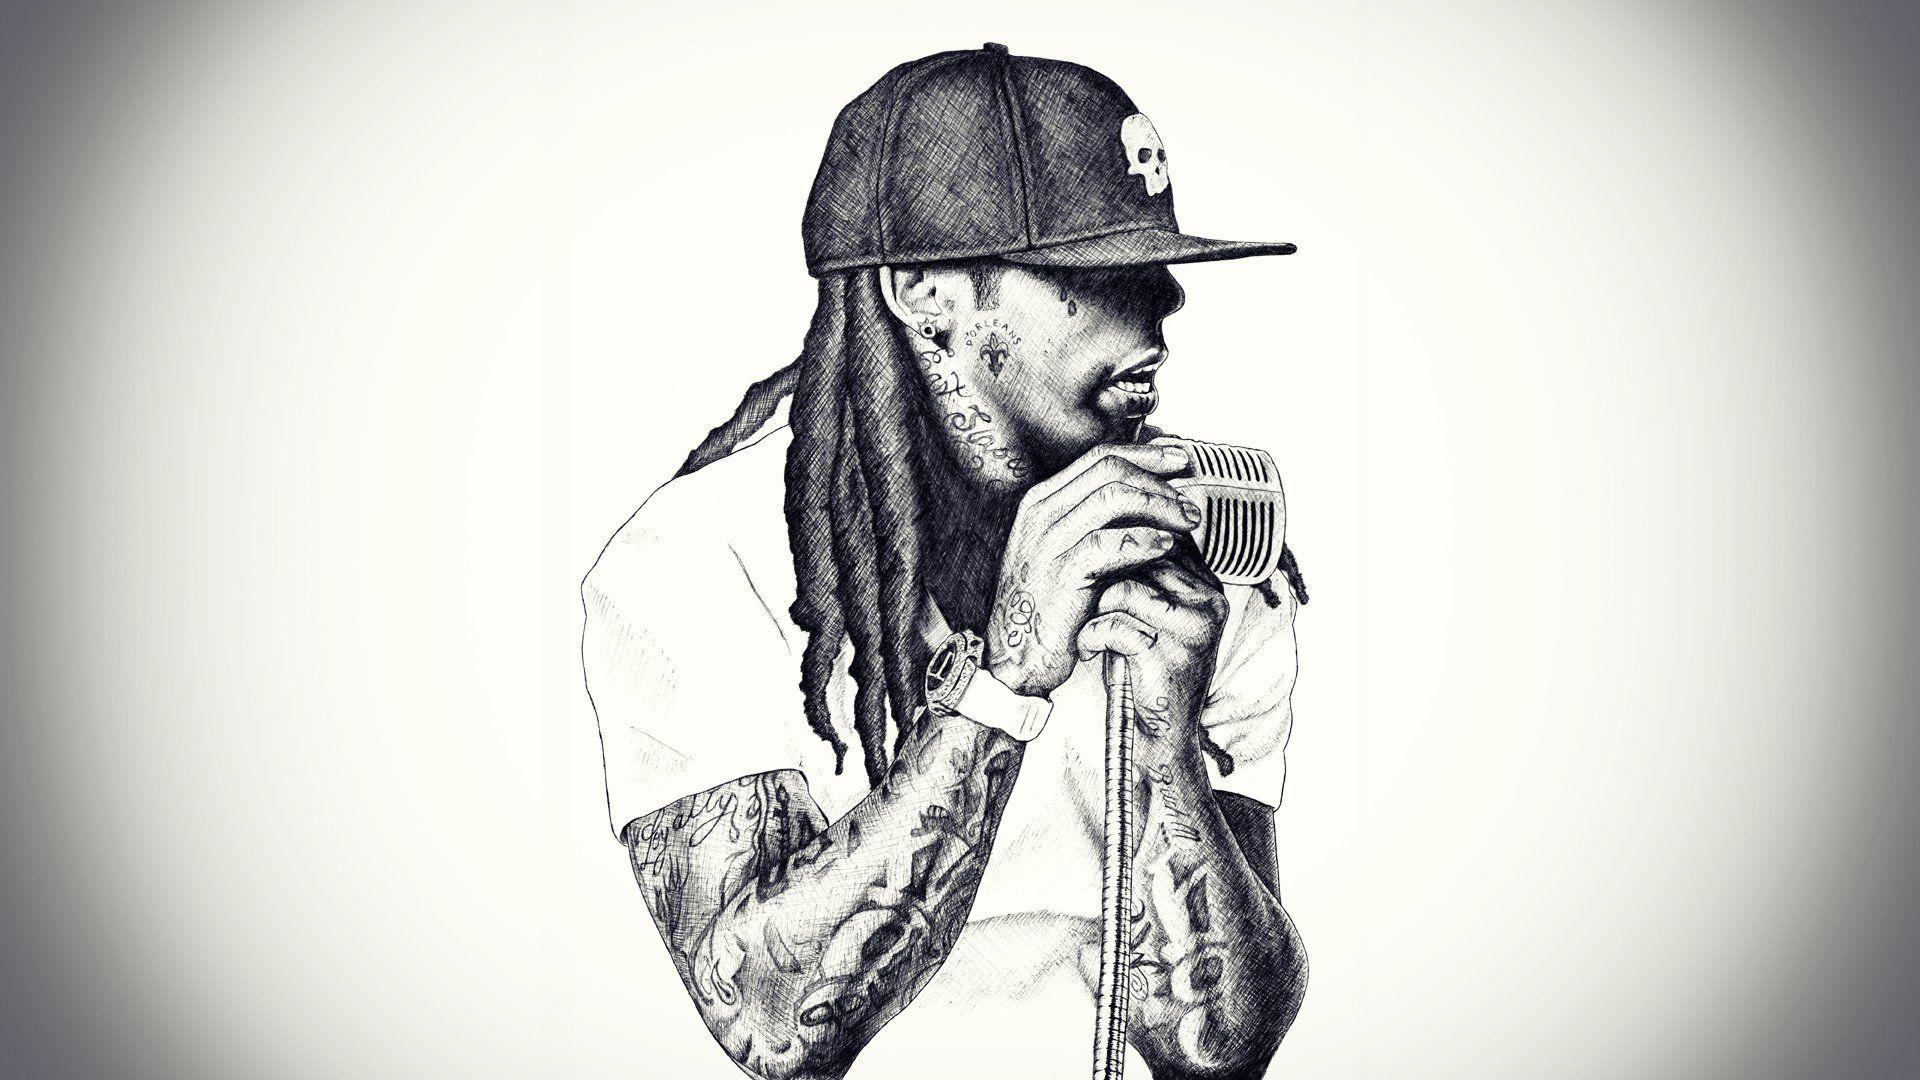 TUPAC gangsta rapper rap hip hop rj wallpaper 1920×1080